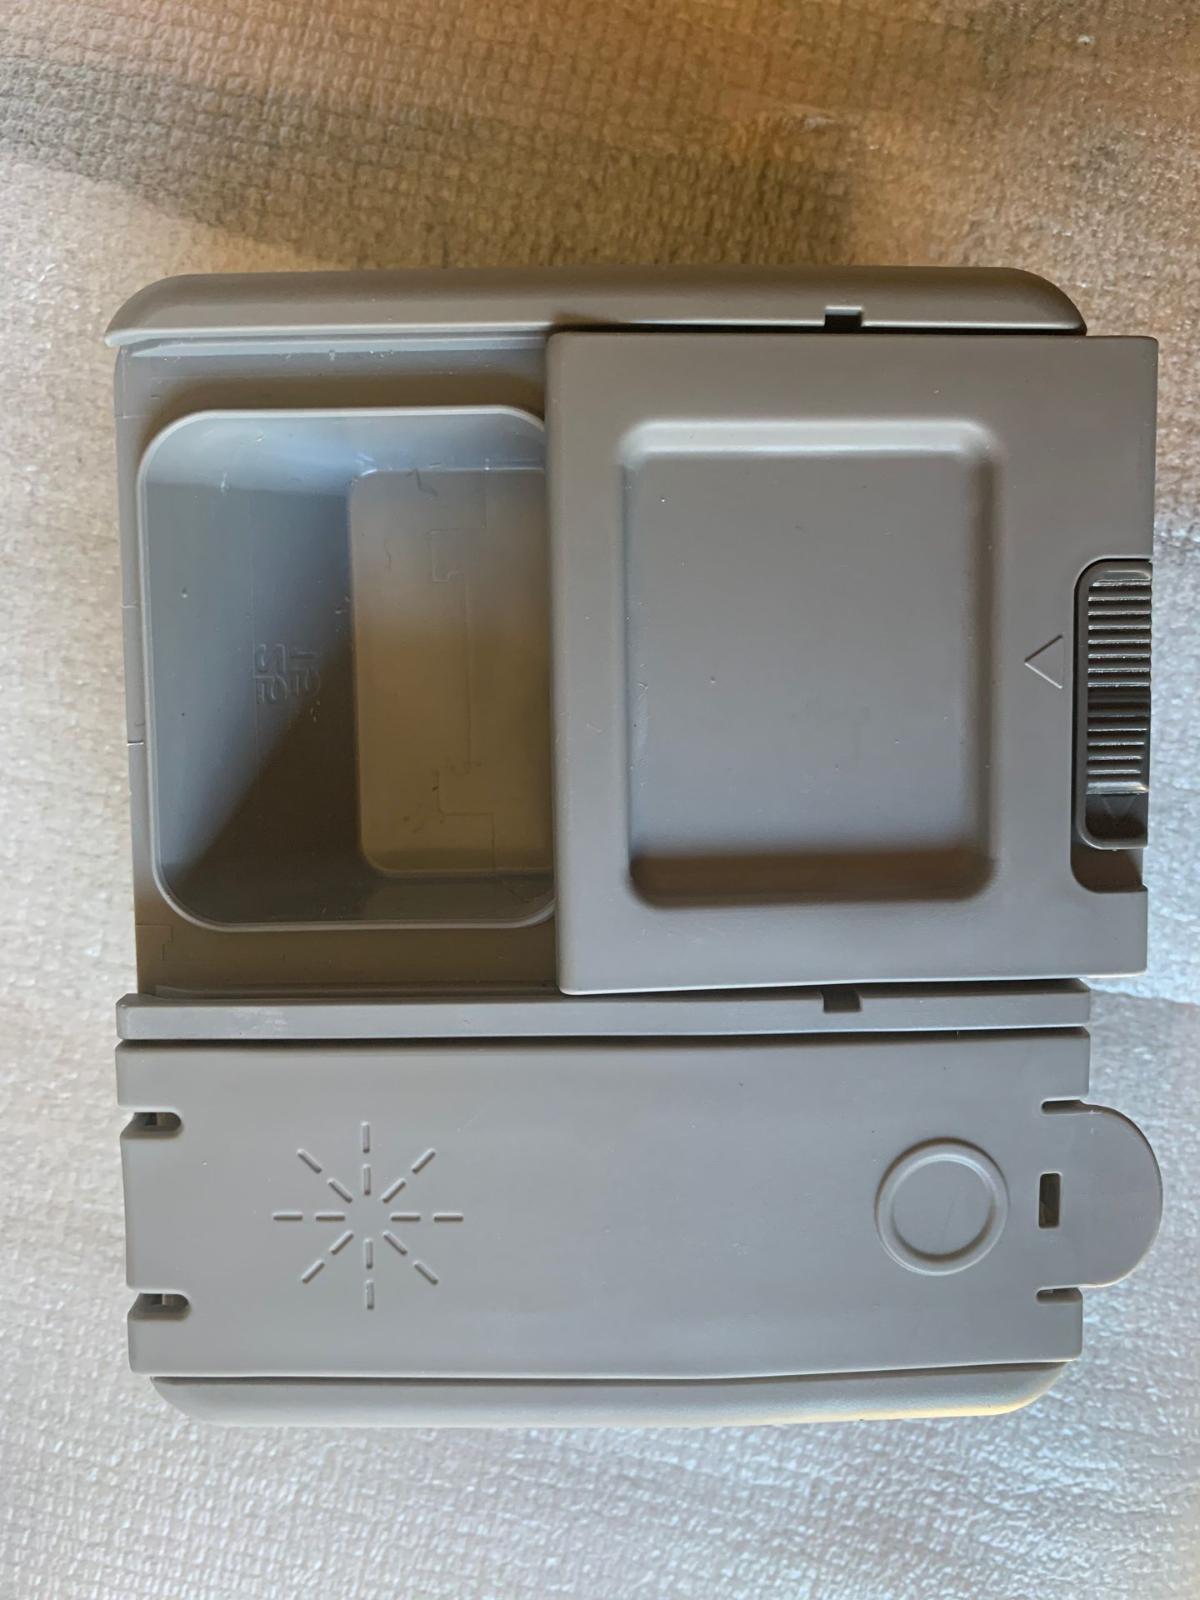 lg dishwasher soap dispenser dd81 02628a